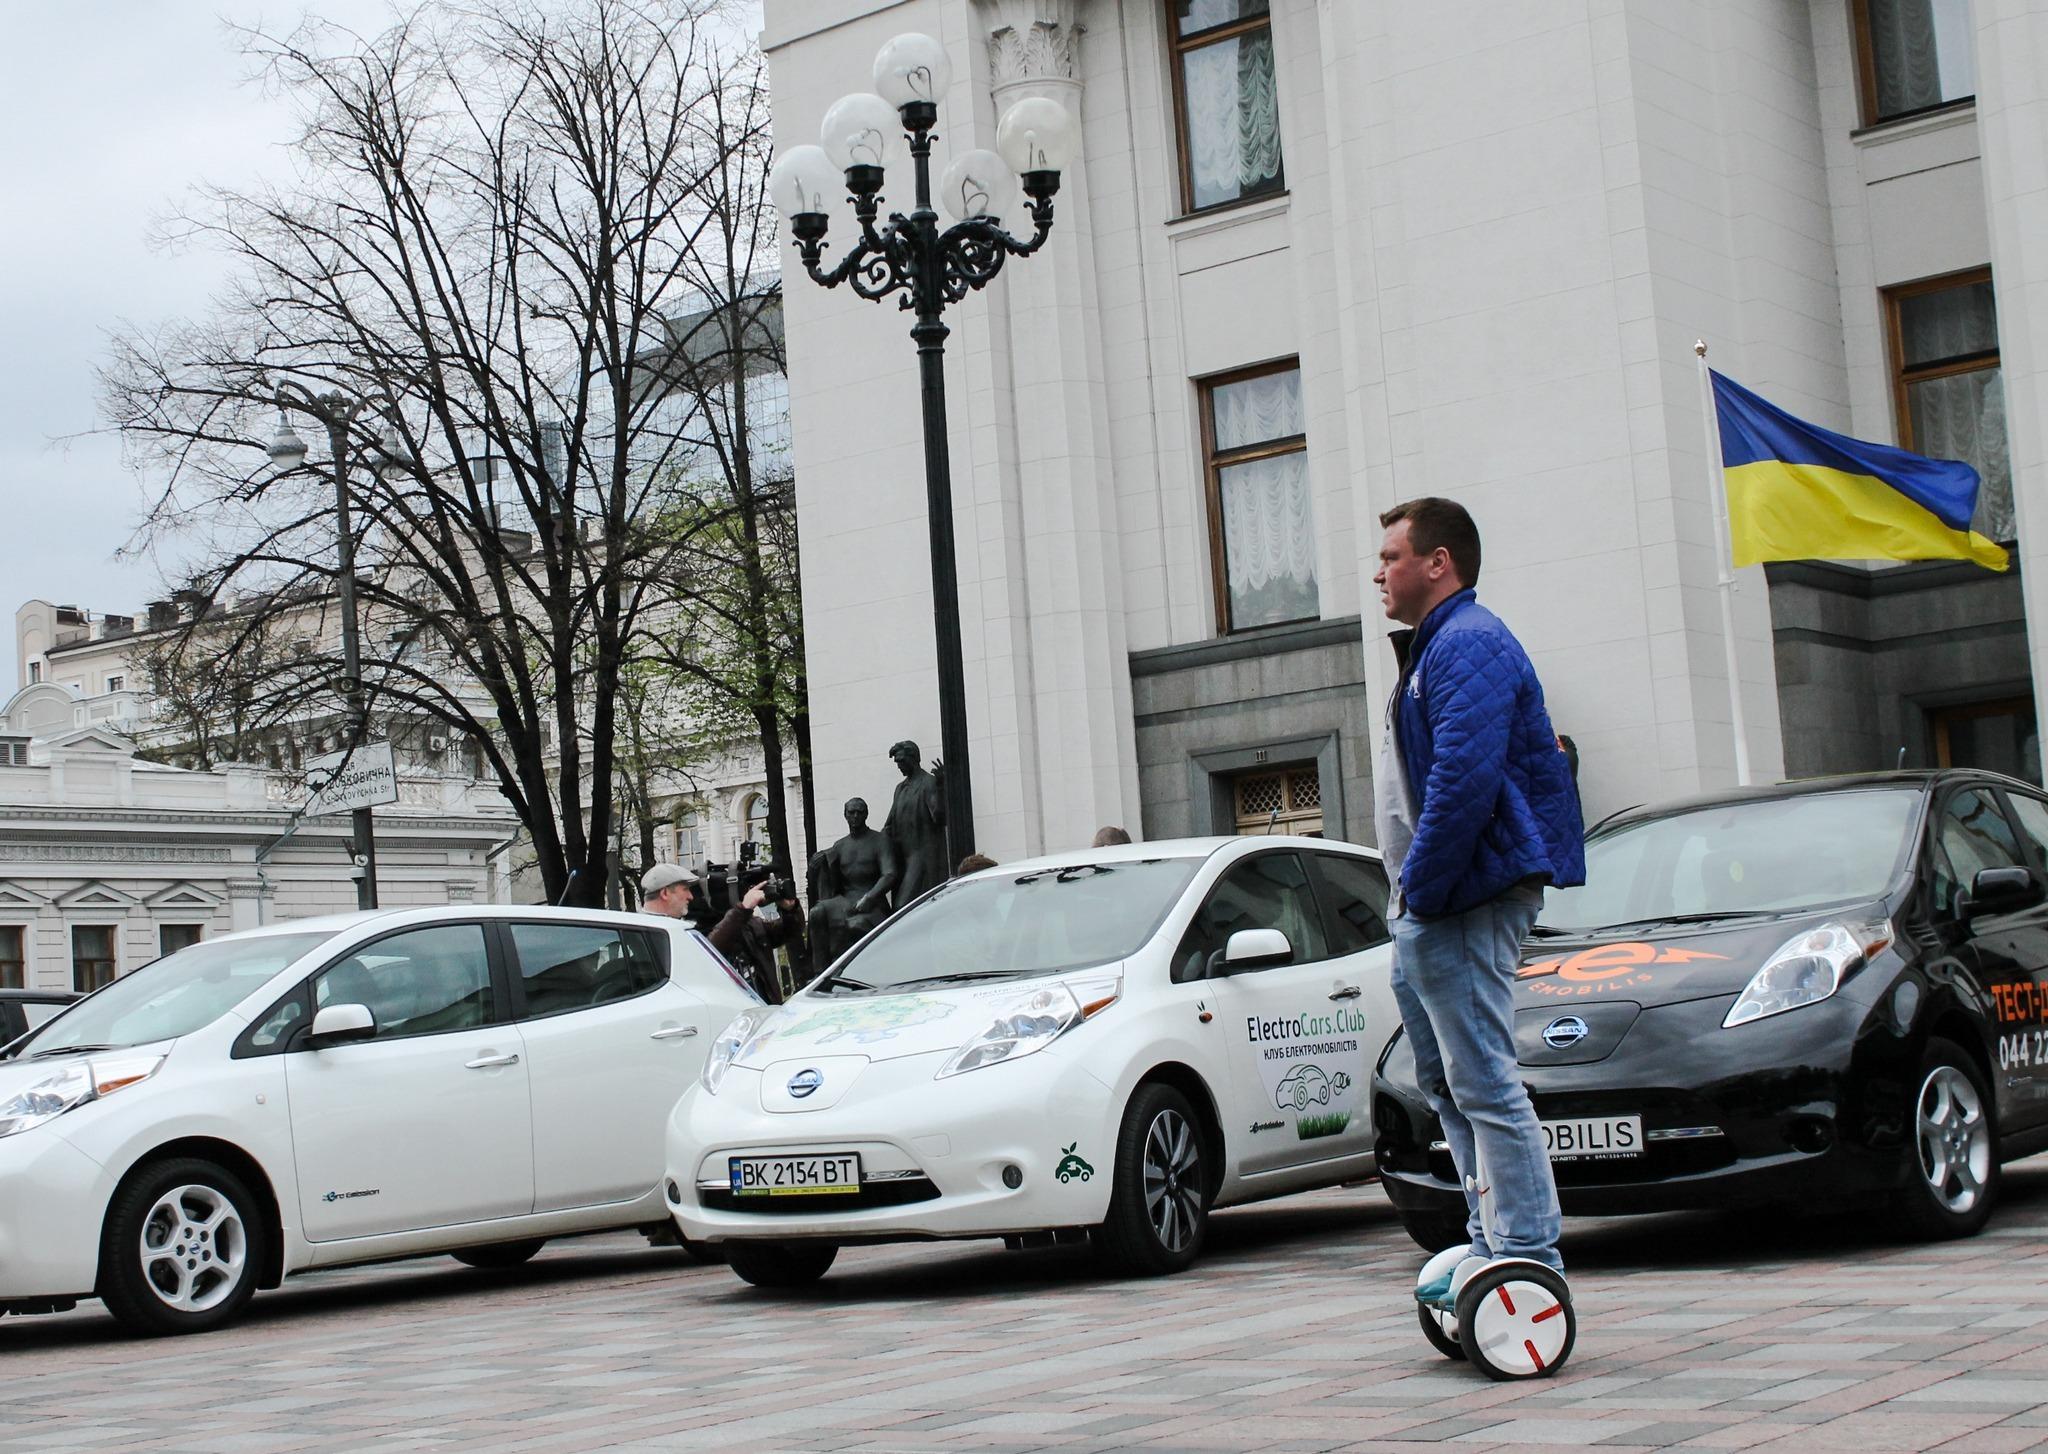 Resultado de imagem para electric cars in Ukraine